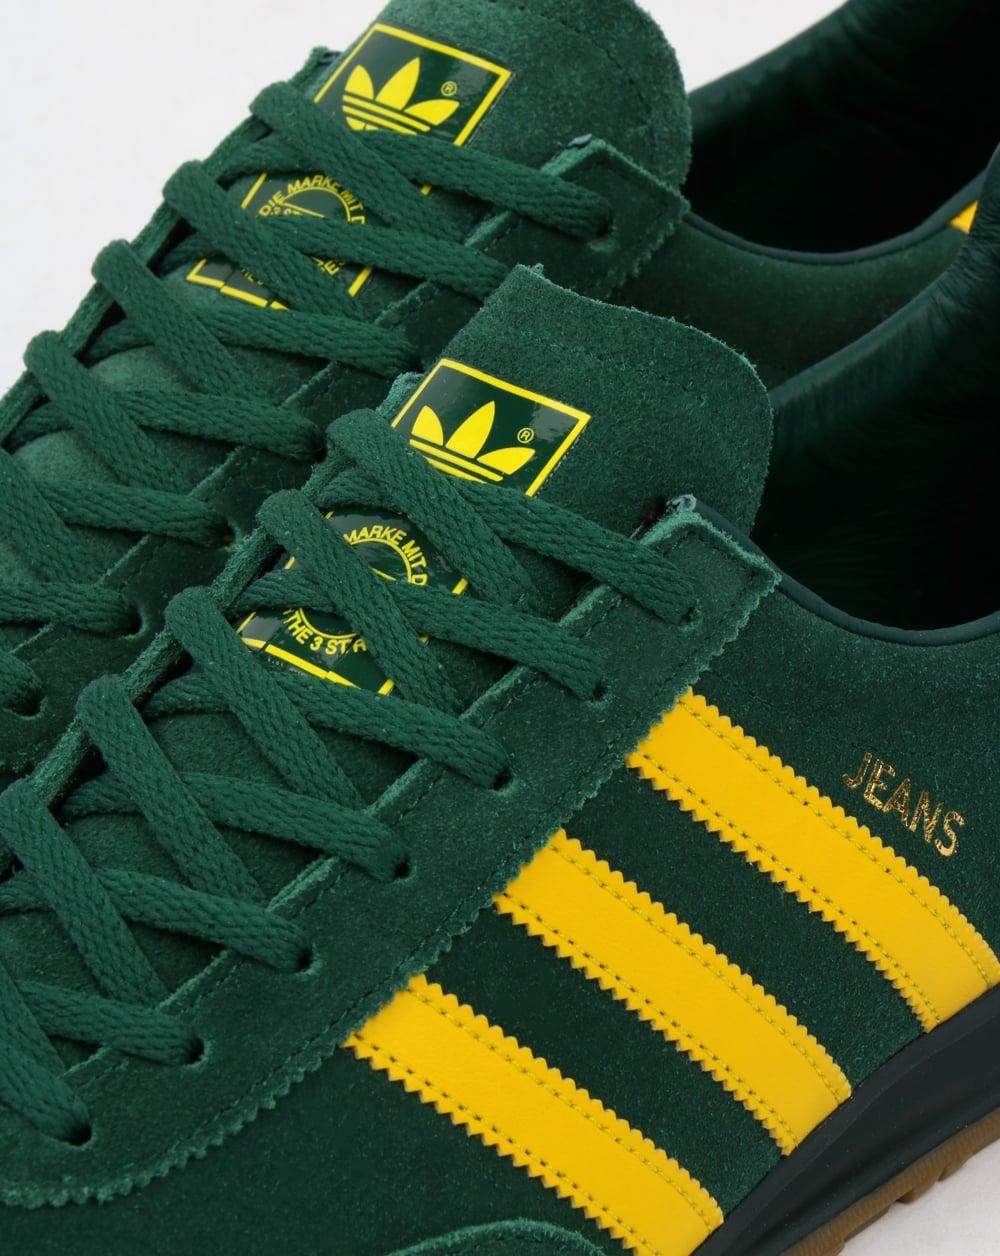 premium selection e9b0f 6c8c6 Adidas Jeans Trainers Mk2 GreenYellow